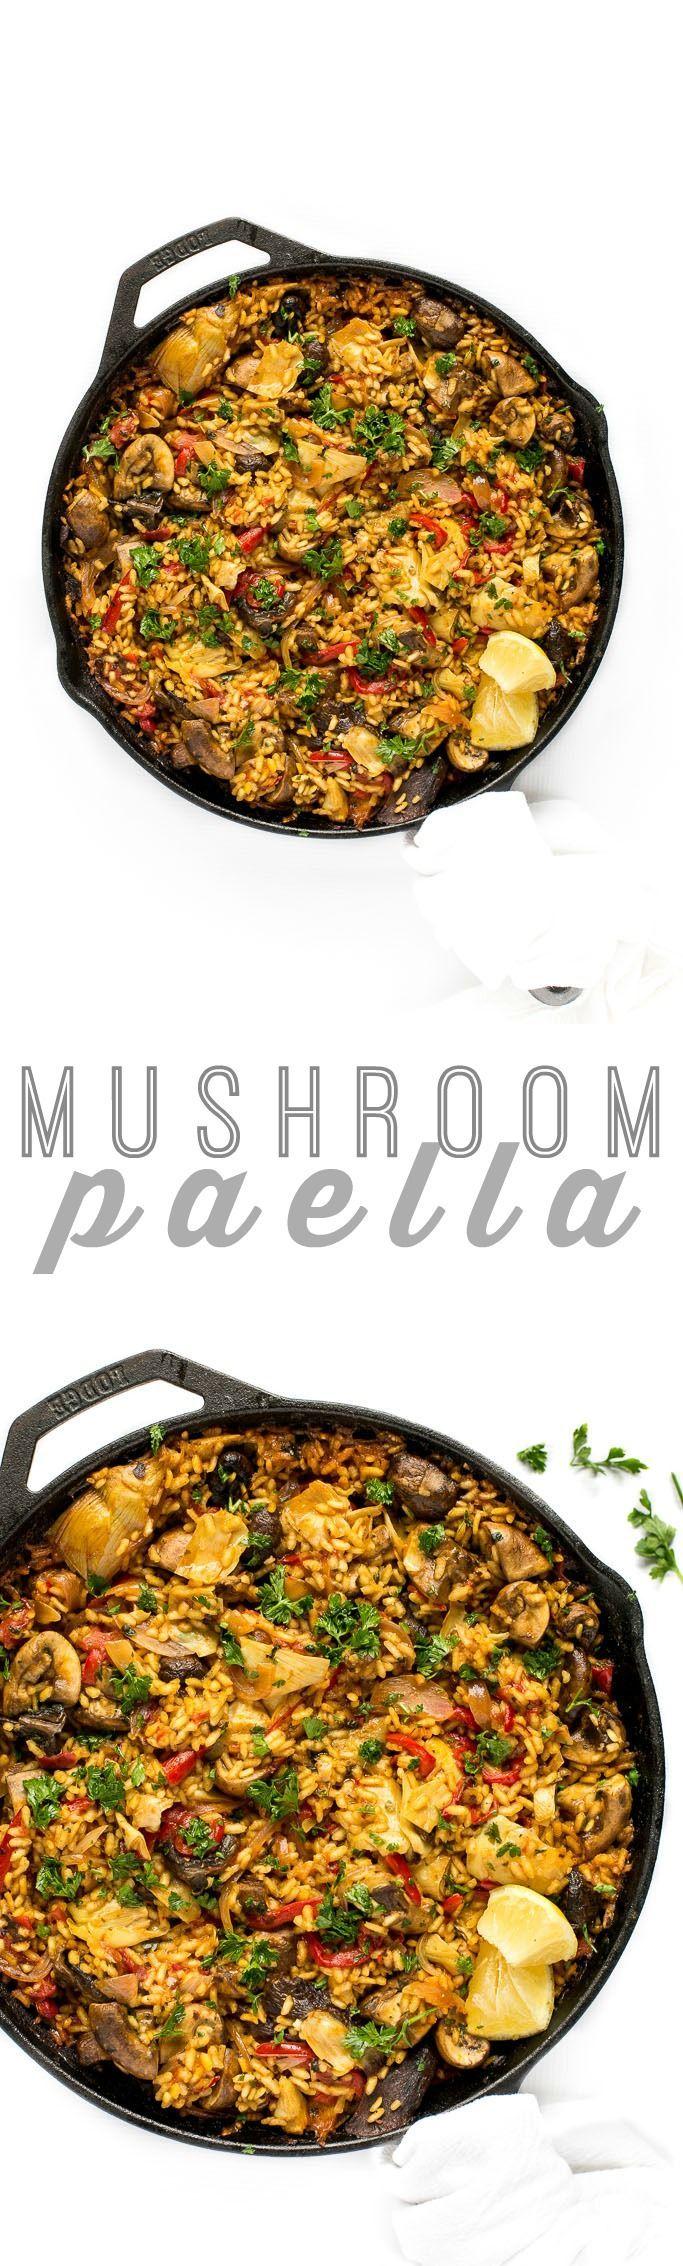 Mushroom Paella + Tips for the Perfect Vegan Paella